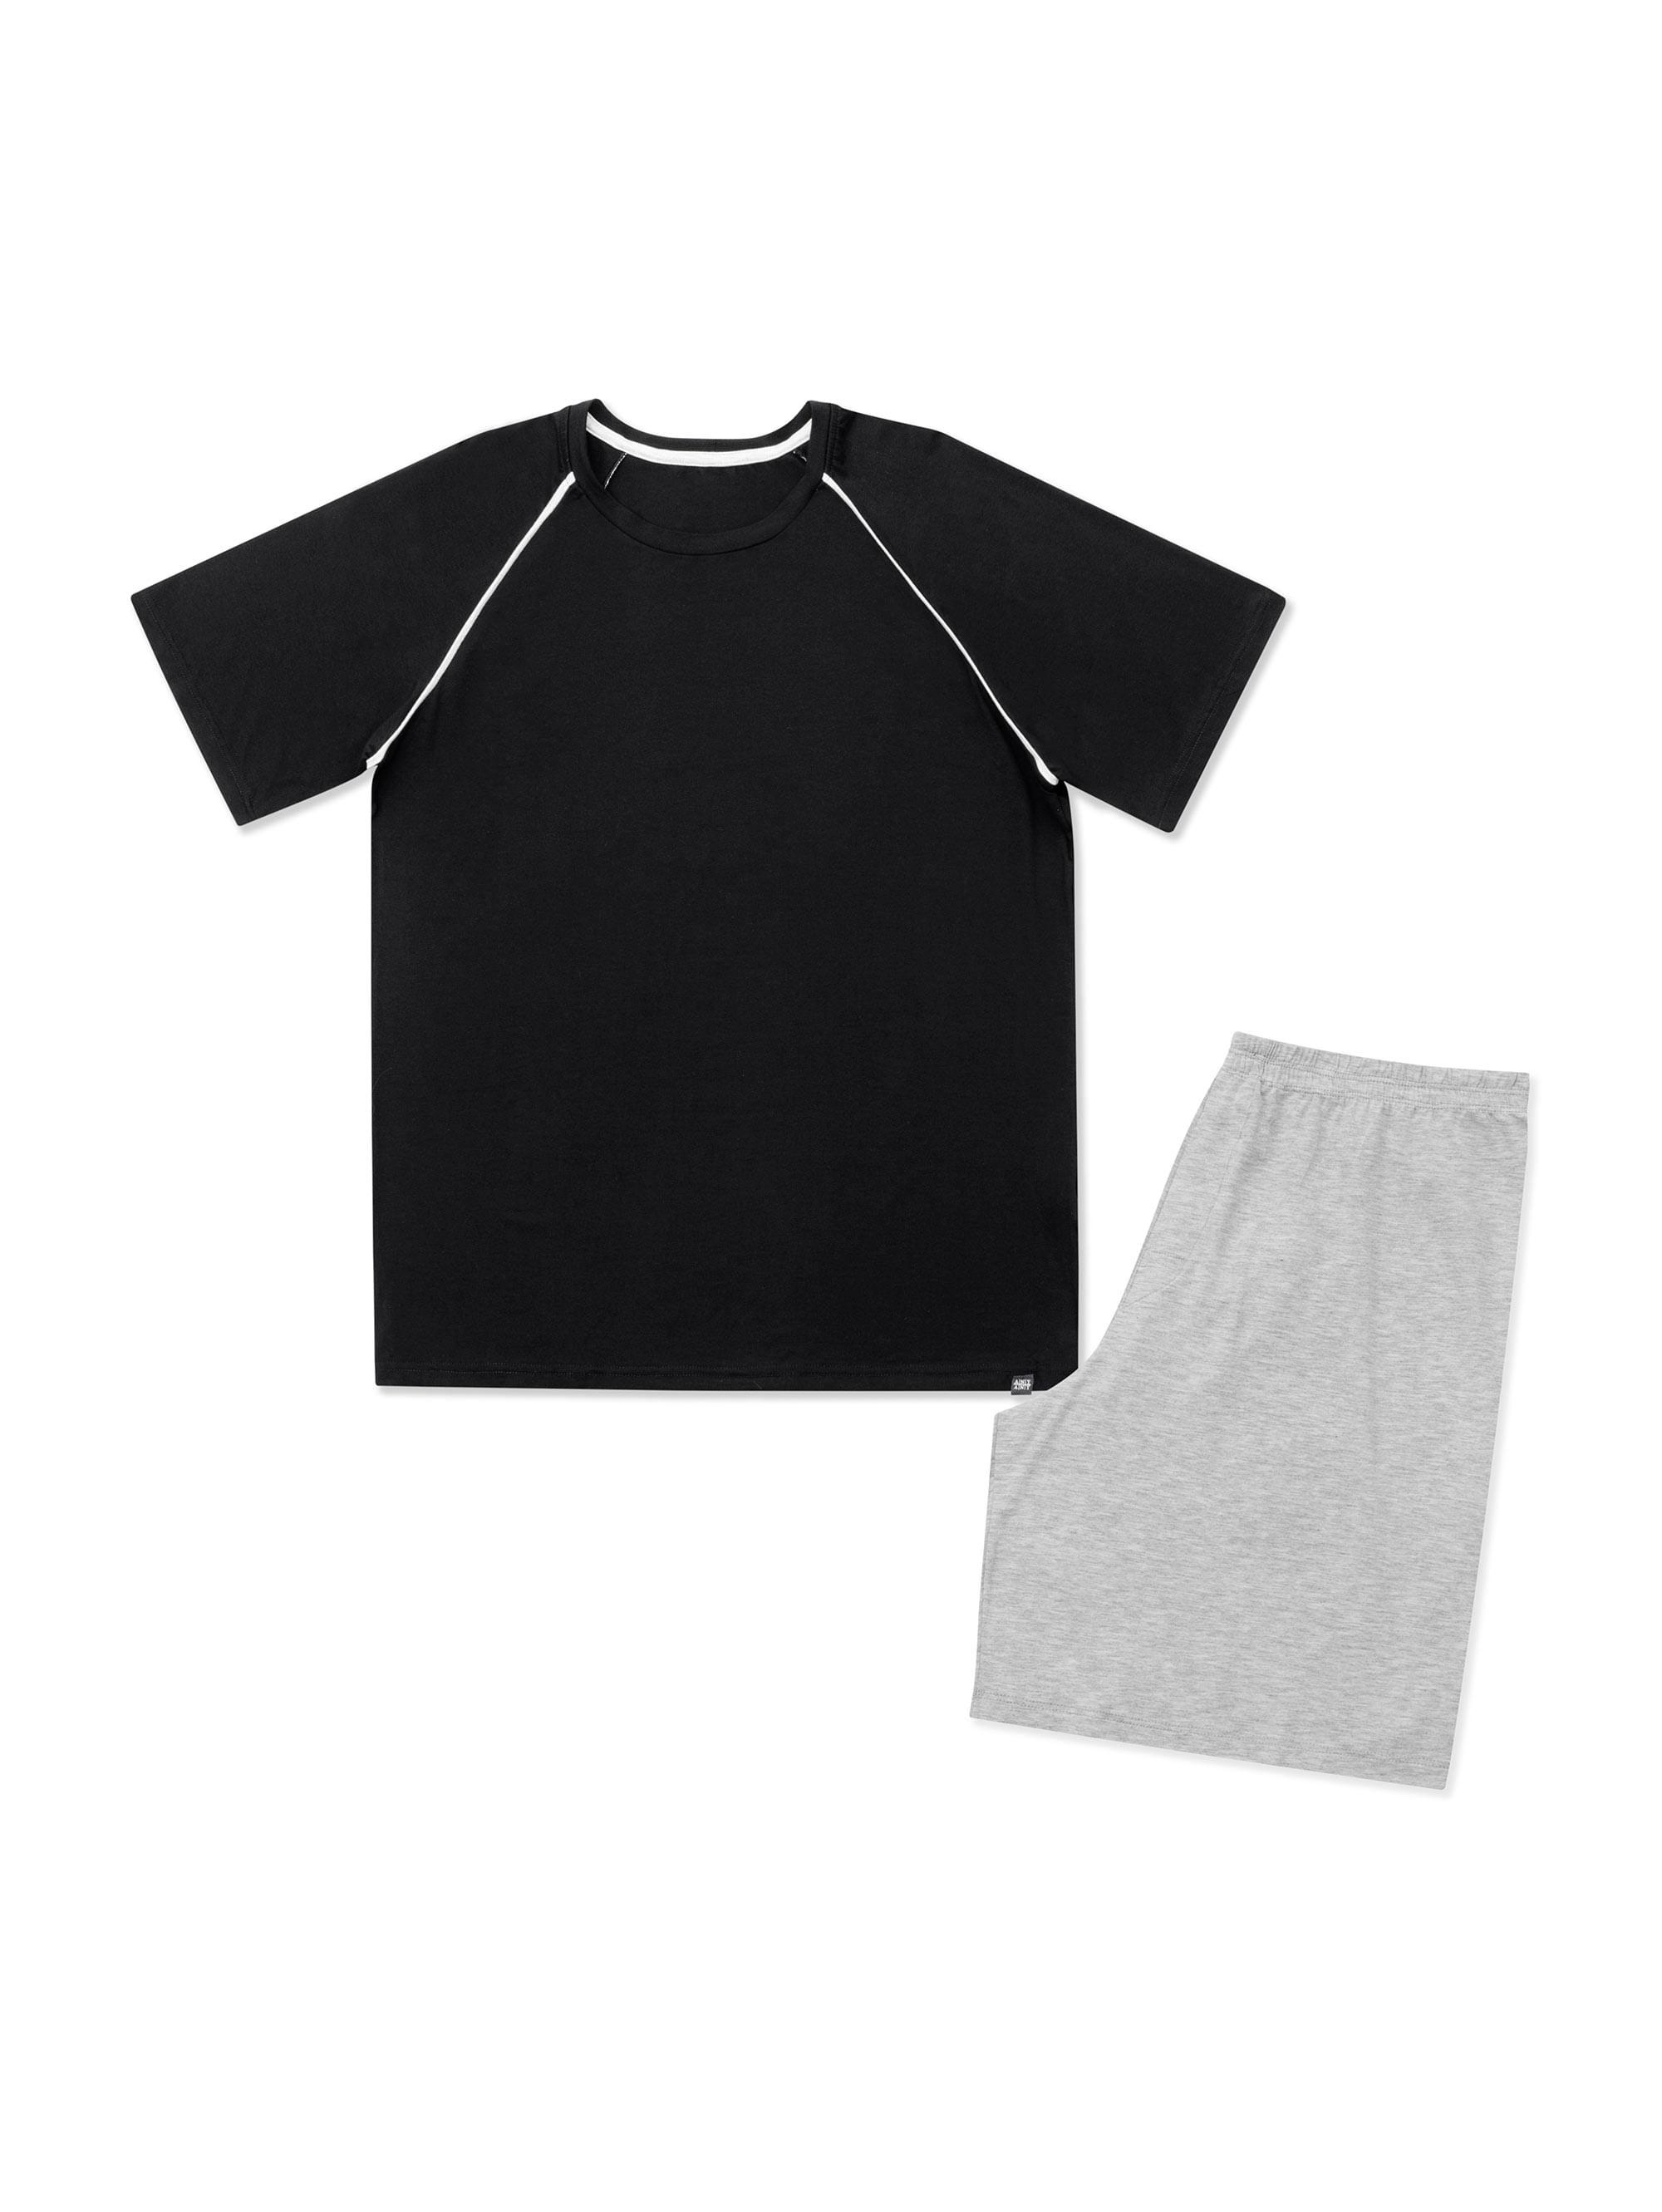 Pijama-Curto--Manga-Curta--M--Passat---OUT---04.02.0768---VERSO